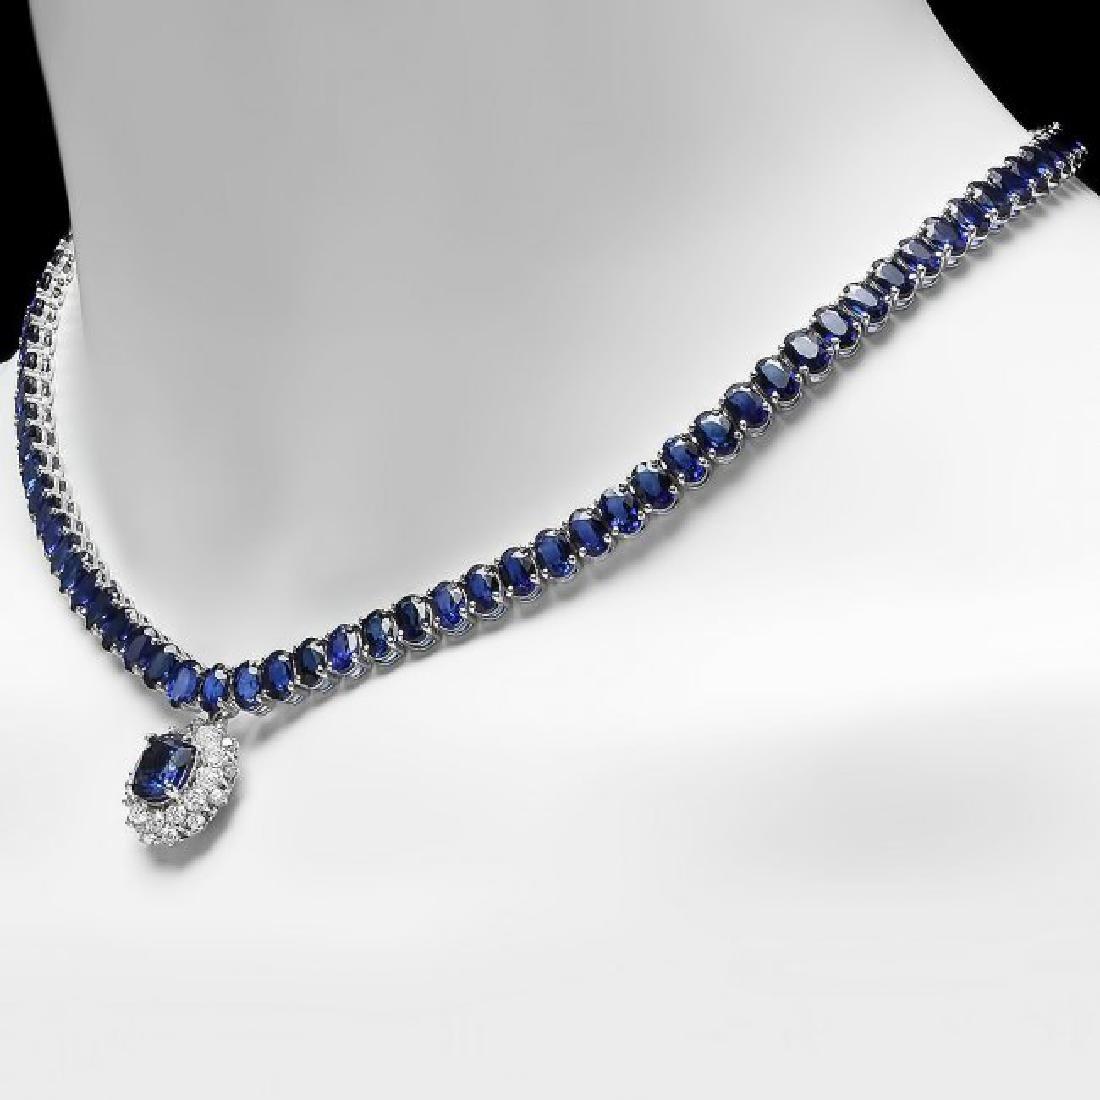 14k Gold 51.5ct Sapphire 1.55ct Diamond Necklace - 5